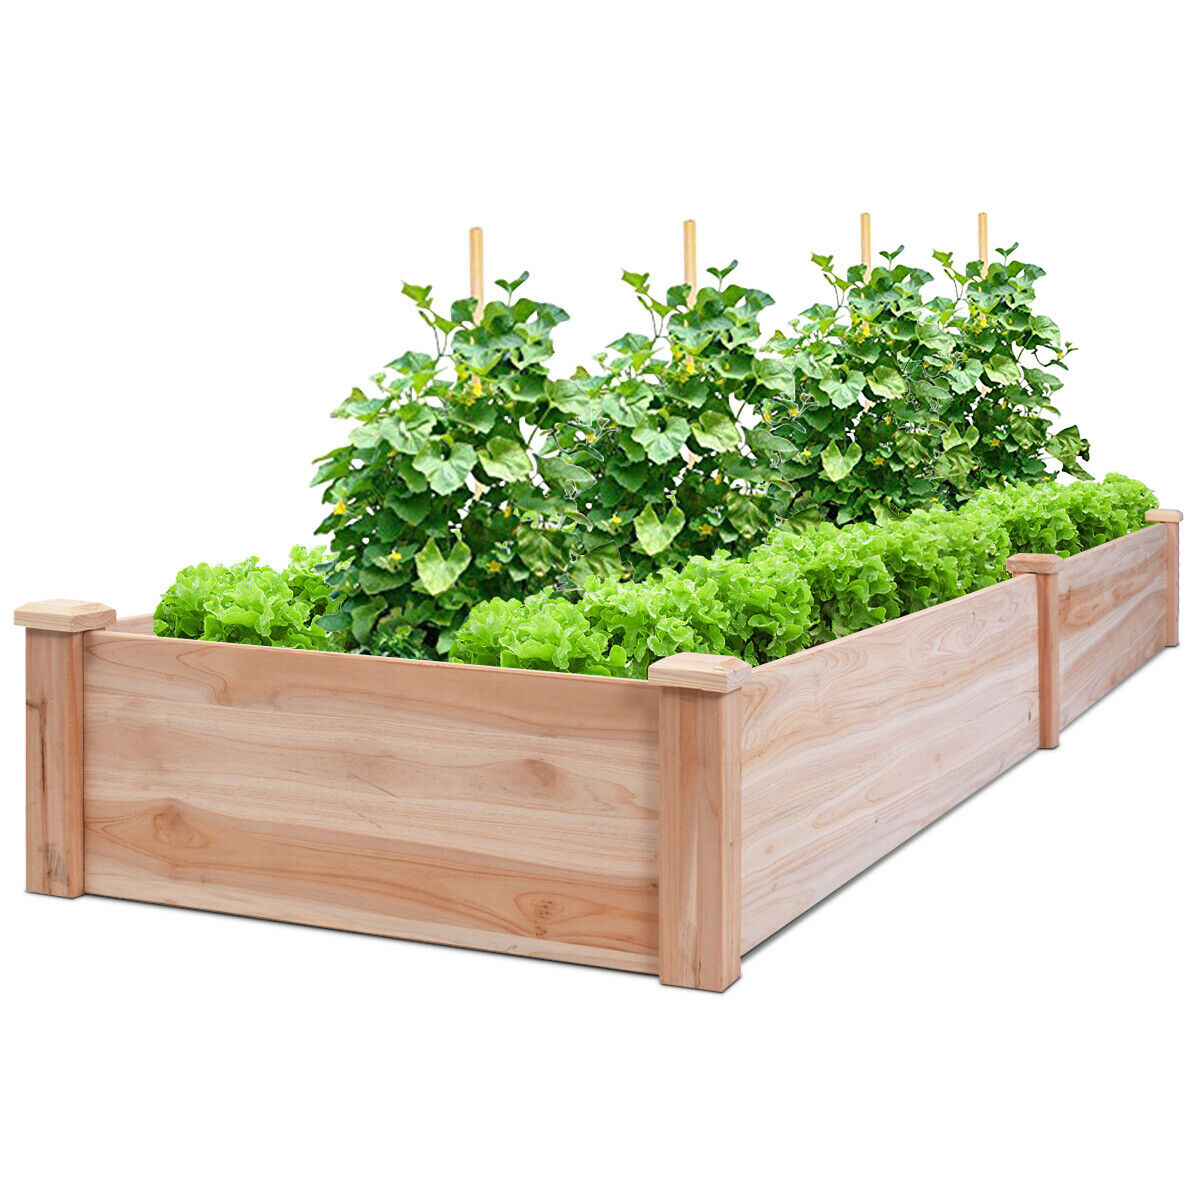 Costway Wooden Vegetable Raised Garden Bed Backyard Patio Grow Flowers Plants Planter